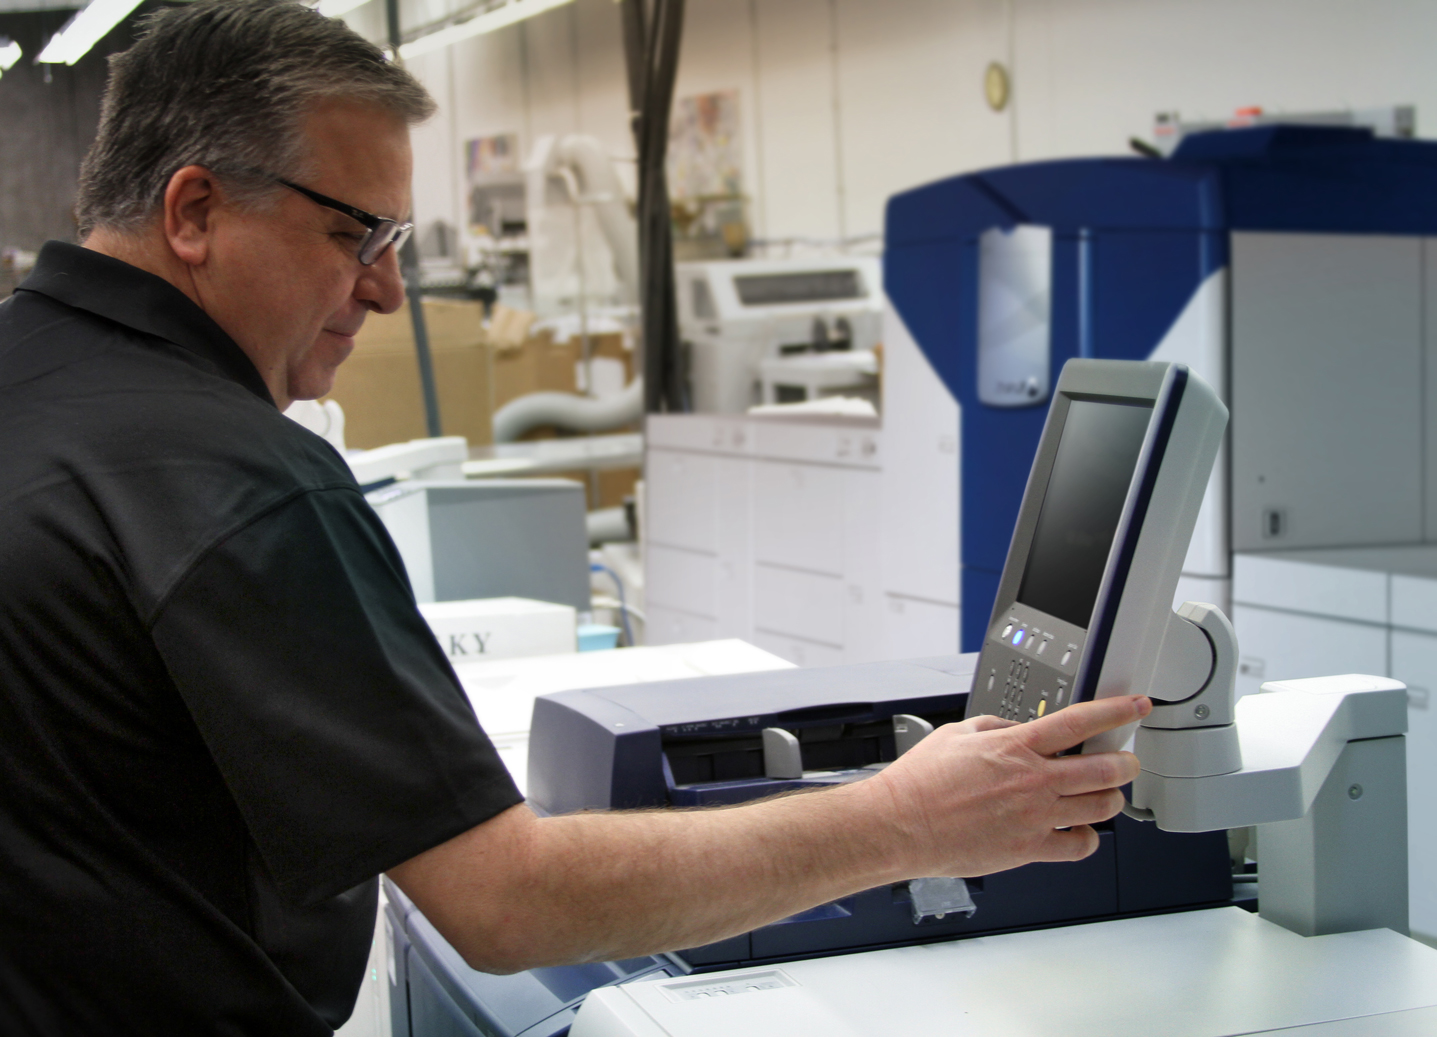 Press Technition working on a Digital Printer